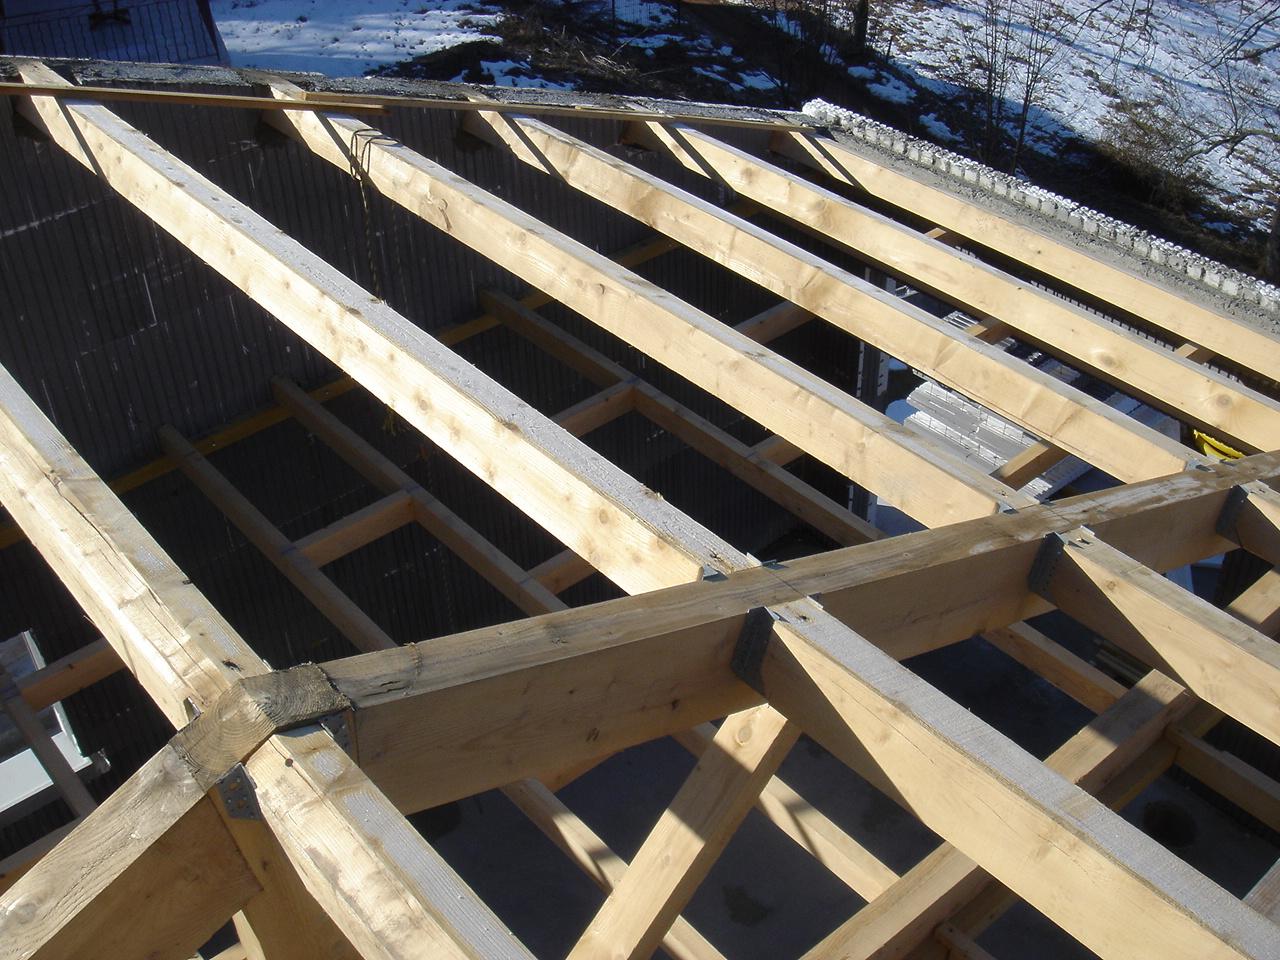 Construire sa maison haute performance avec euromac2 isolation de toiture en rampant for Construire sa toiture